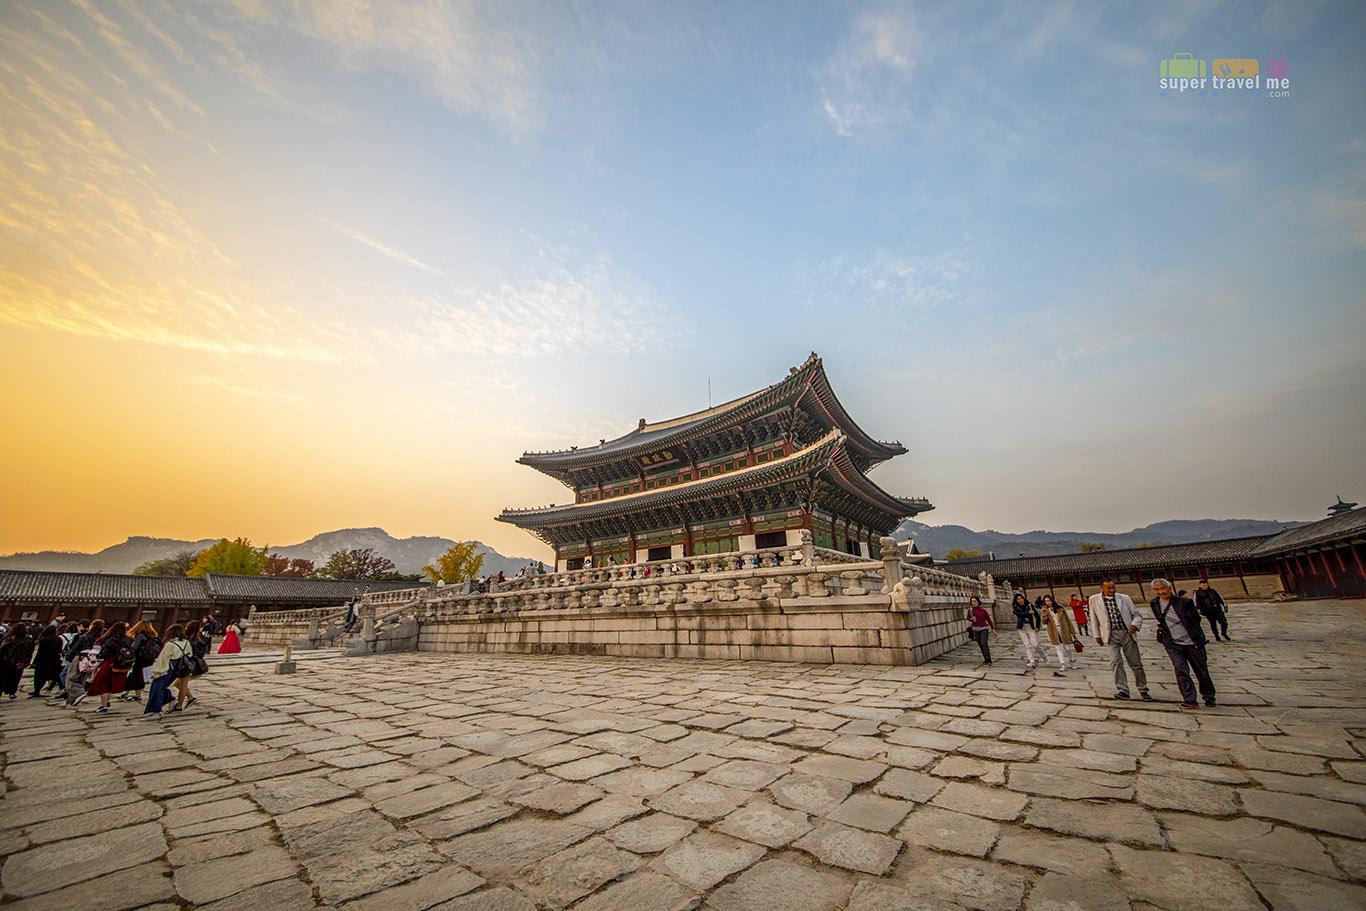 Sunset at Gyeongbokgung Palace (경복궁), Seoul